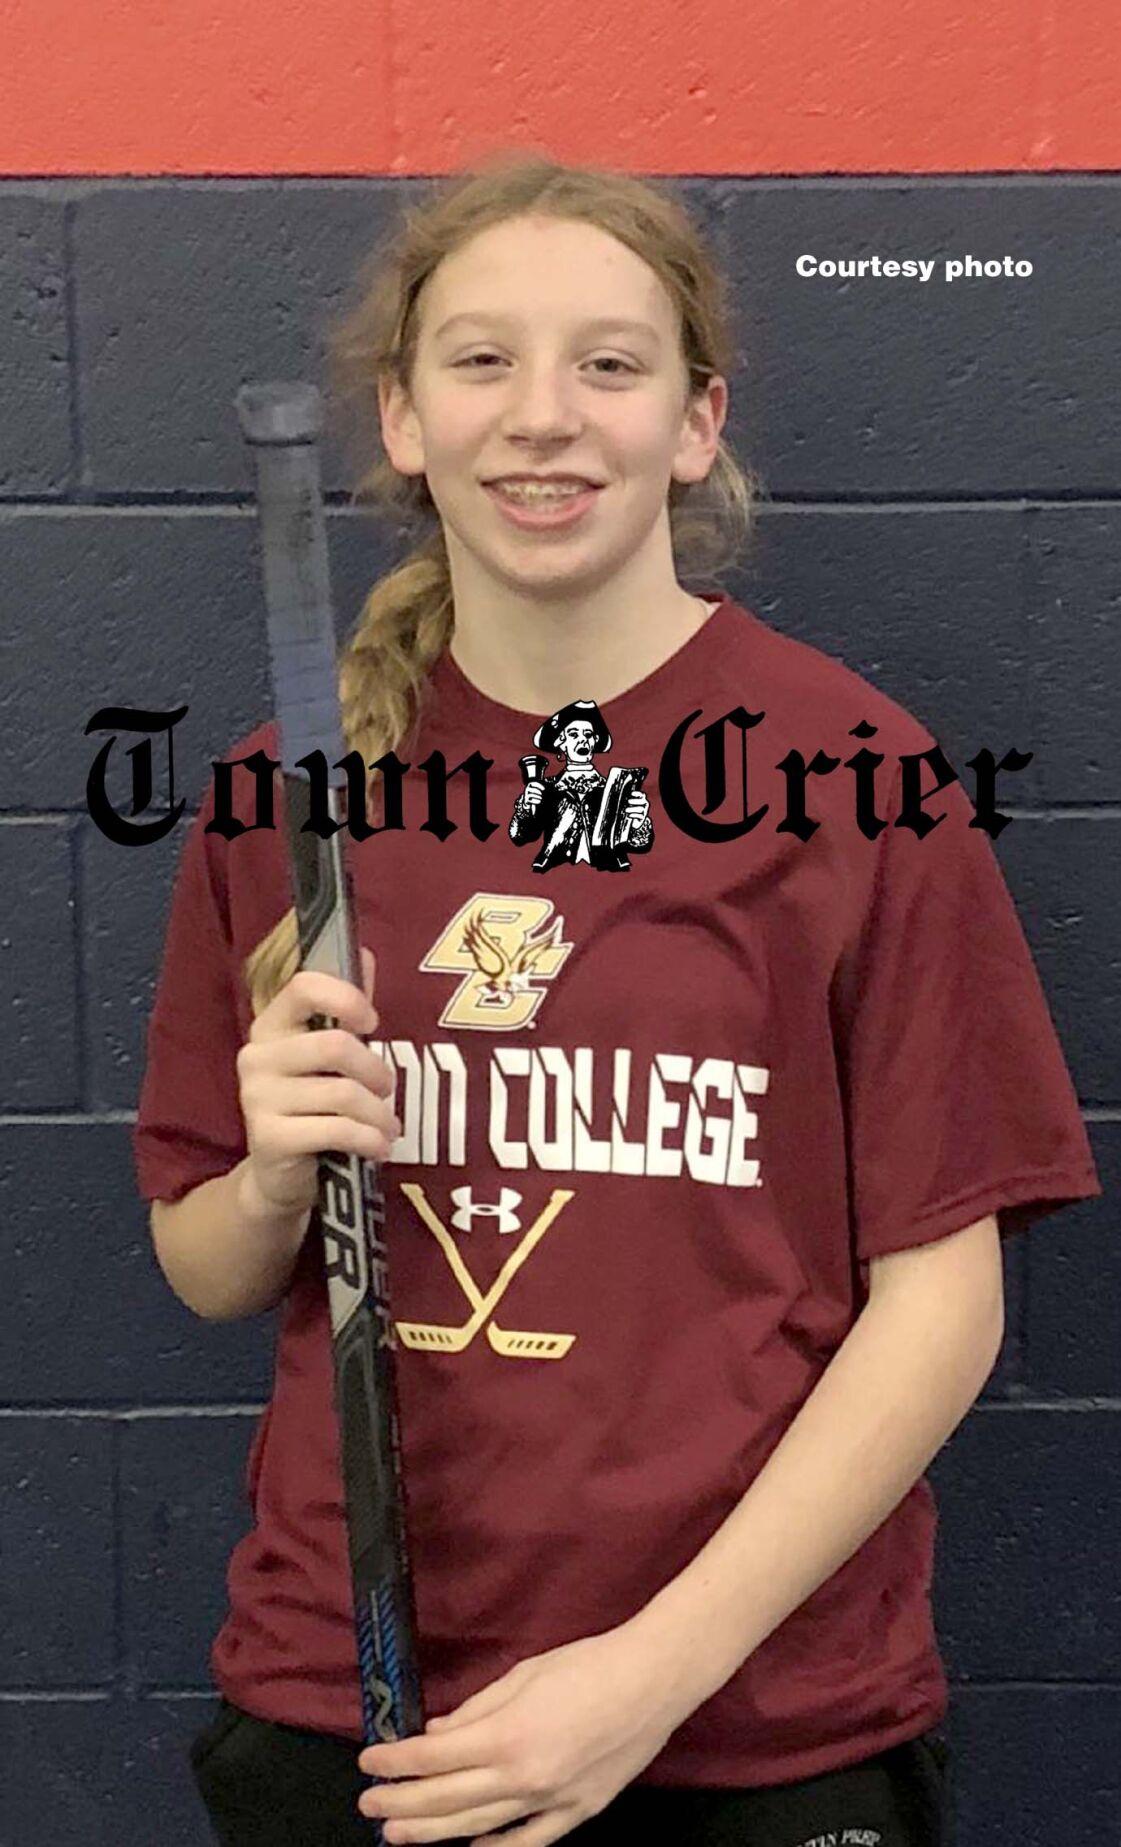 Tewksbury resident Samantha Taber for the Cushing Academy girls' team